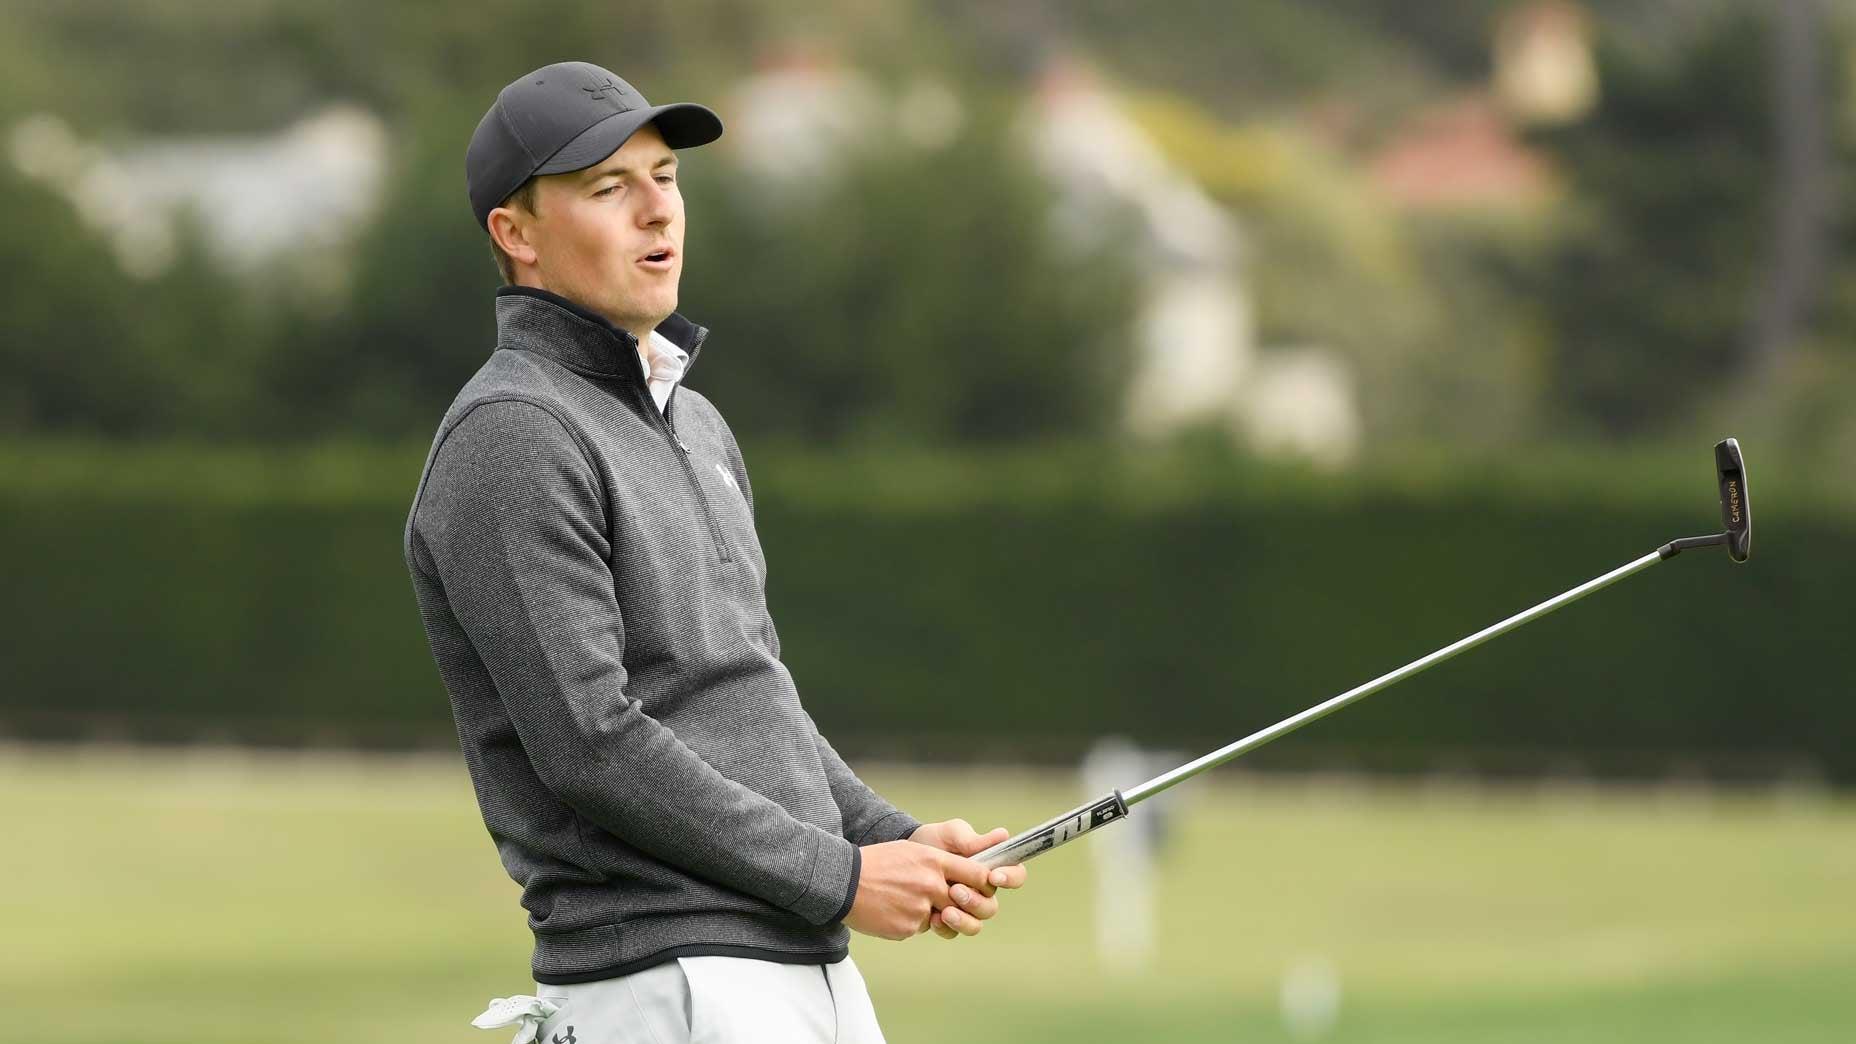 Tour Confidential How Close Is Jordan Spieth To Breaking Through